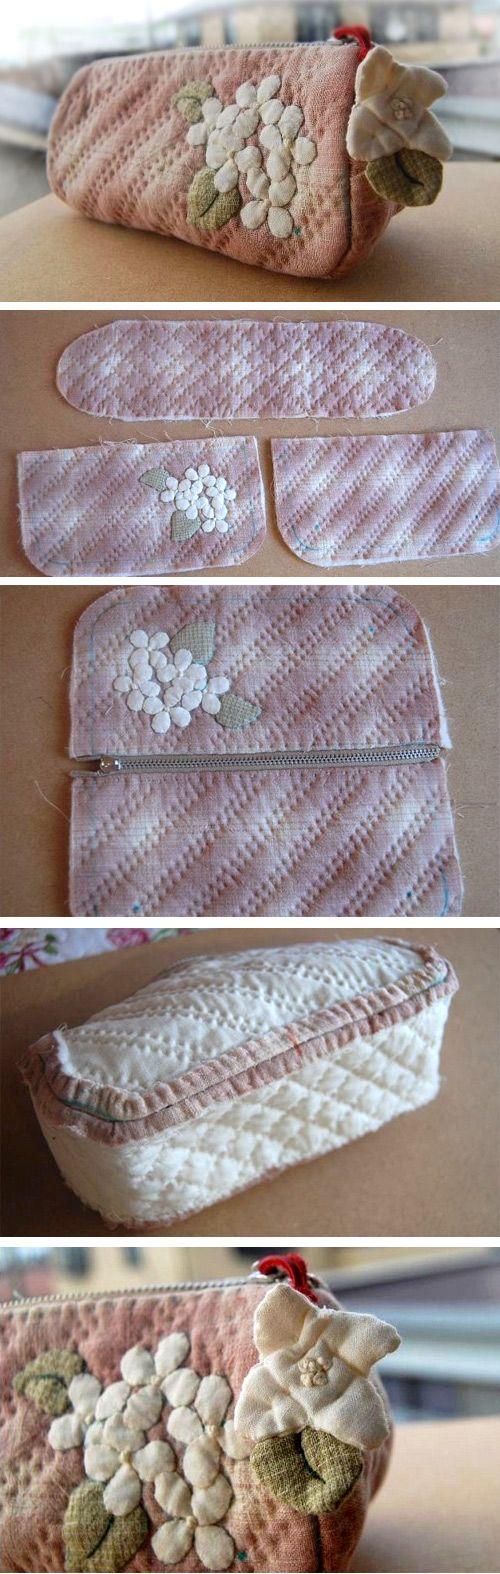 Patchwork and Quilted Zipper Handbag / Cosmetic Bag. DIY Photo Tutorial http://www.handmadiya.com/2016/02/stylish-handbag-clutch-with-flowers.html